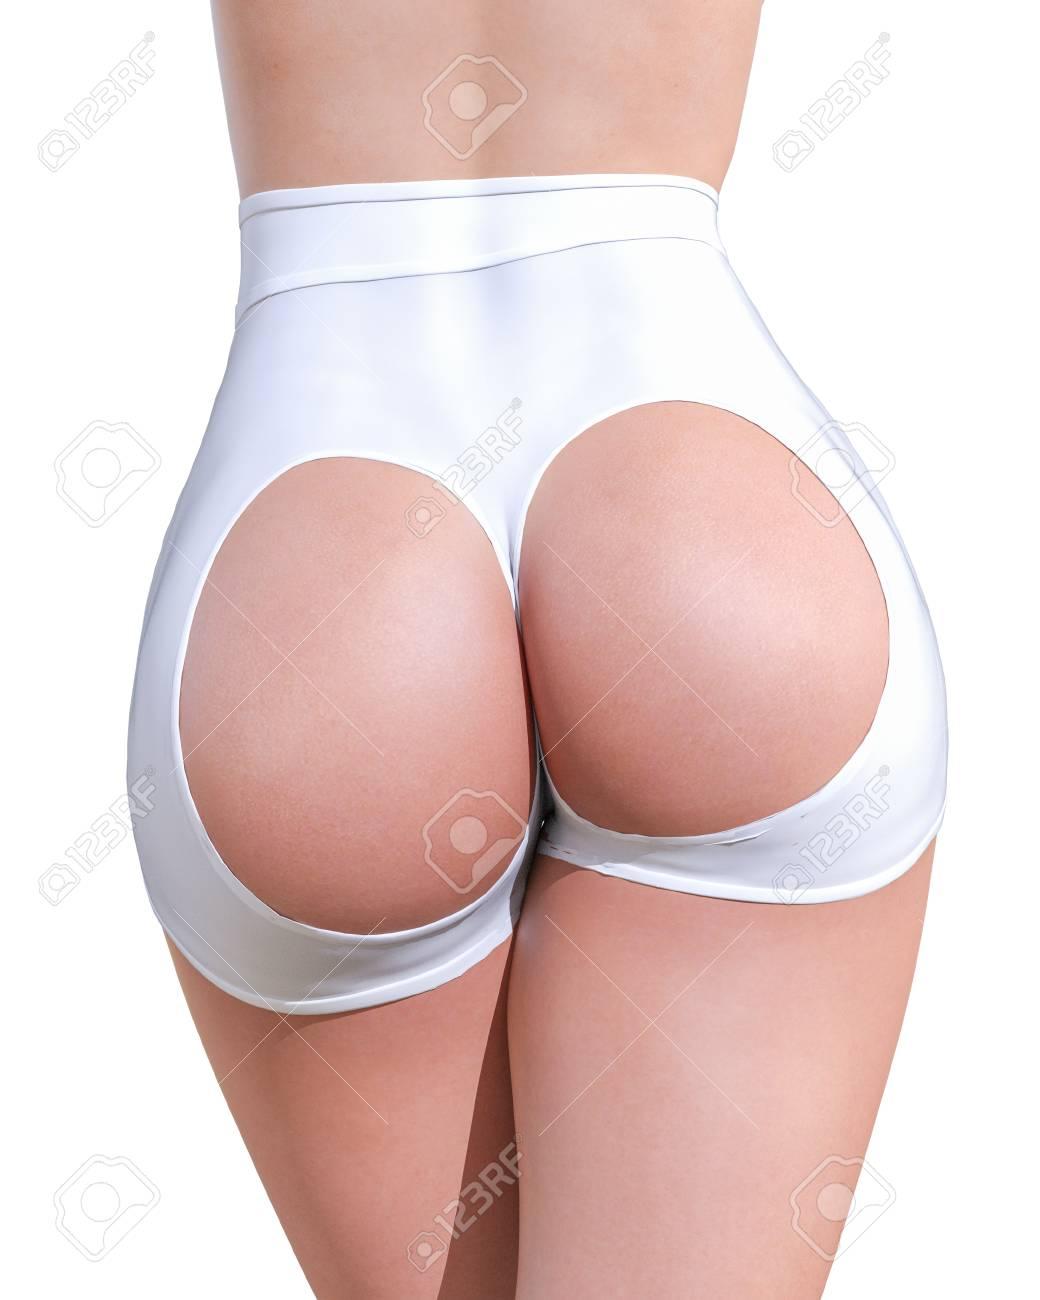 Chunky short naked latinas